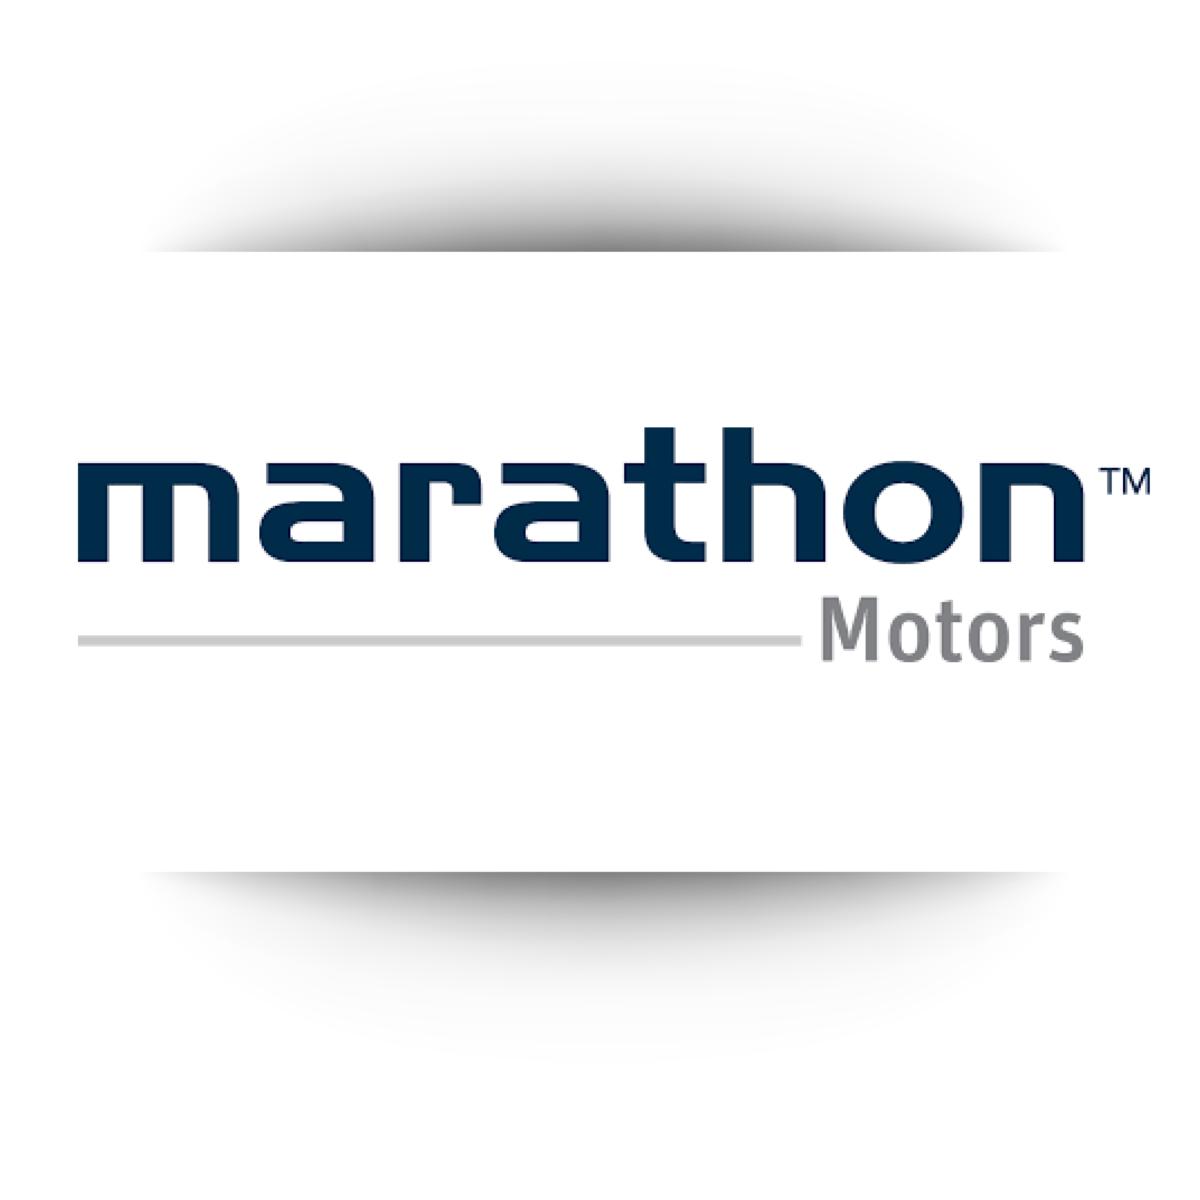 marathon motors logo